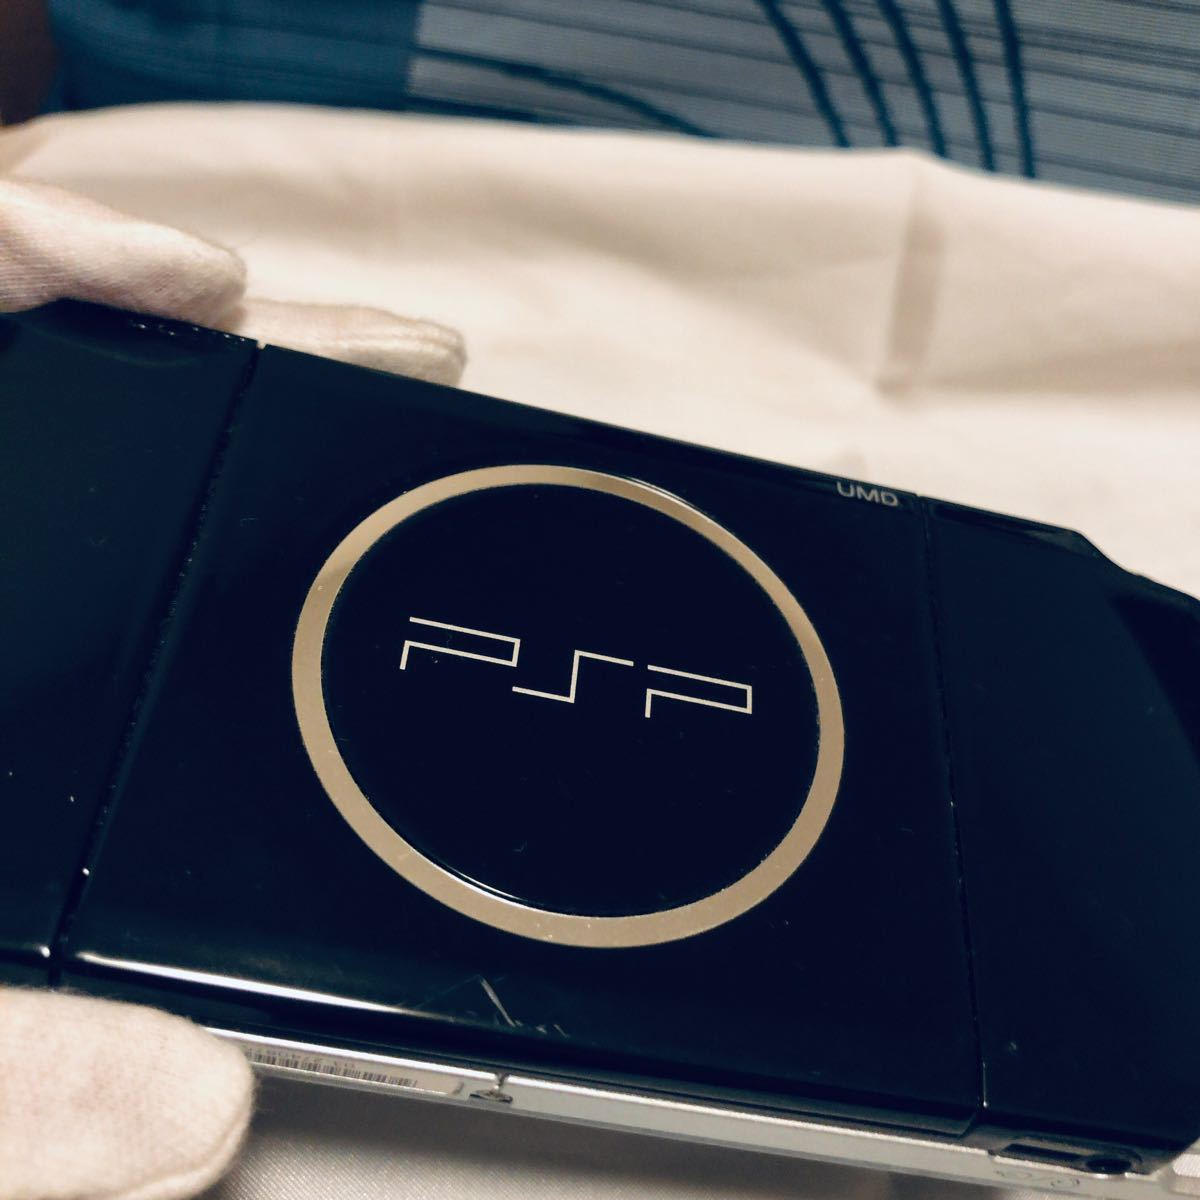 PSP-3000 本体 充電器 取説 バッテリーなし